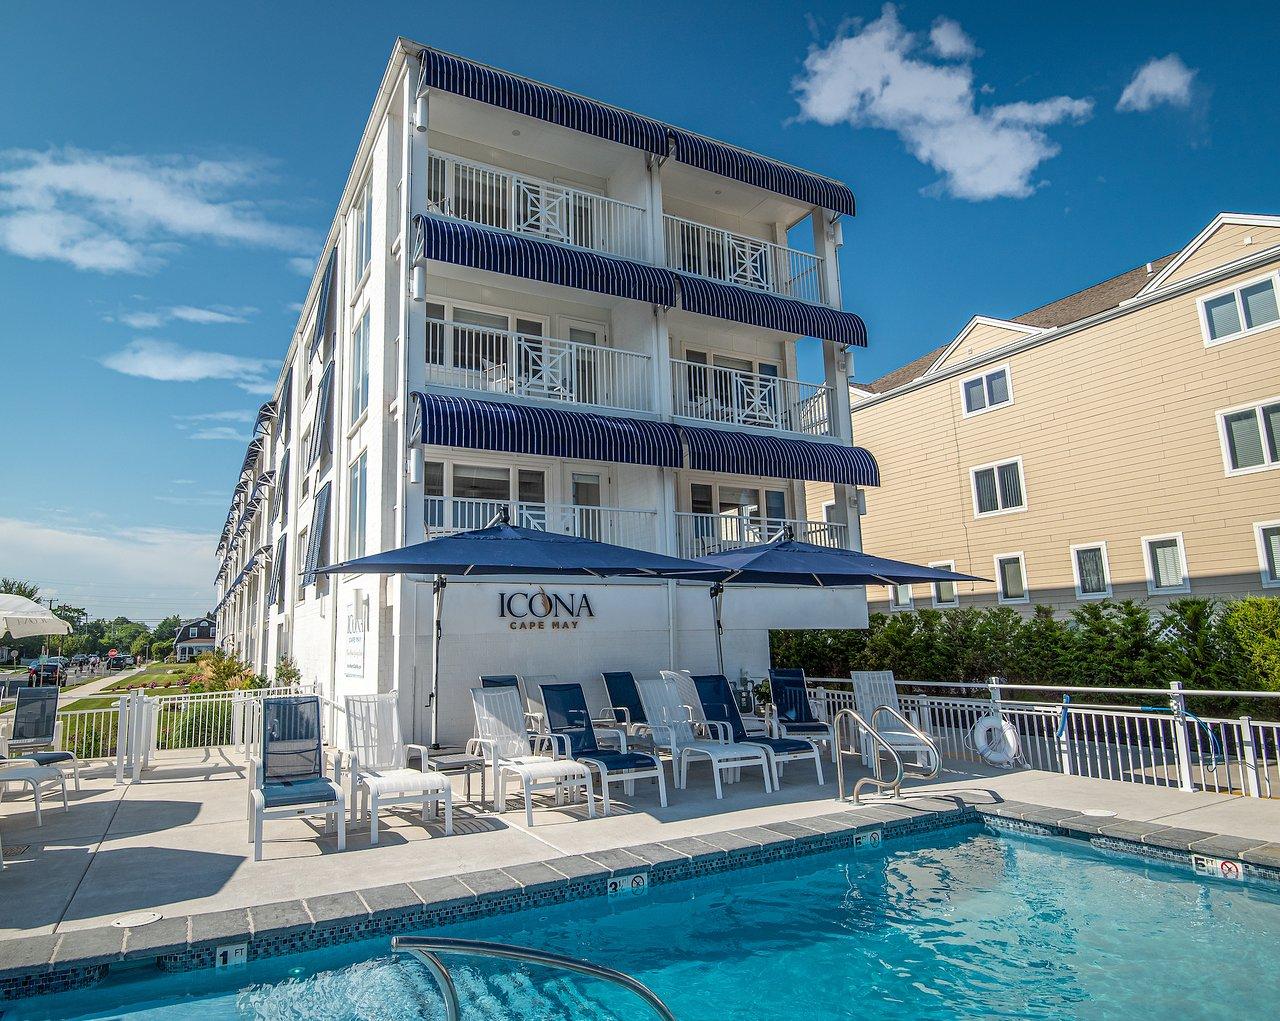 Icona Cape May 159 2 9 9 Updated 2021 Prices Hotel Reviews Nj Tripadvisor